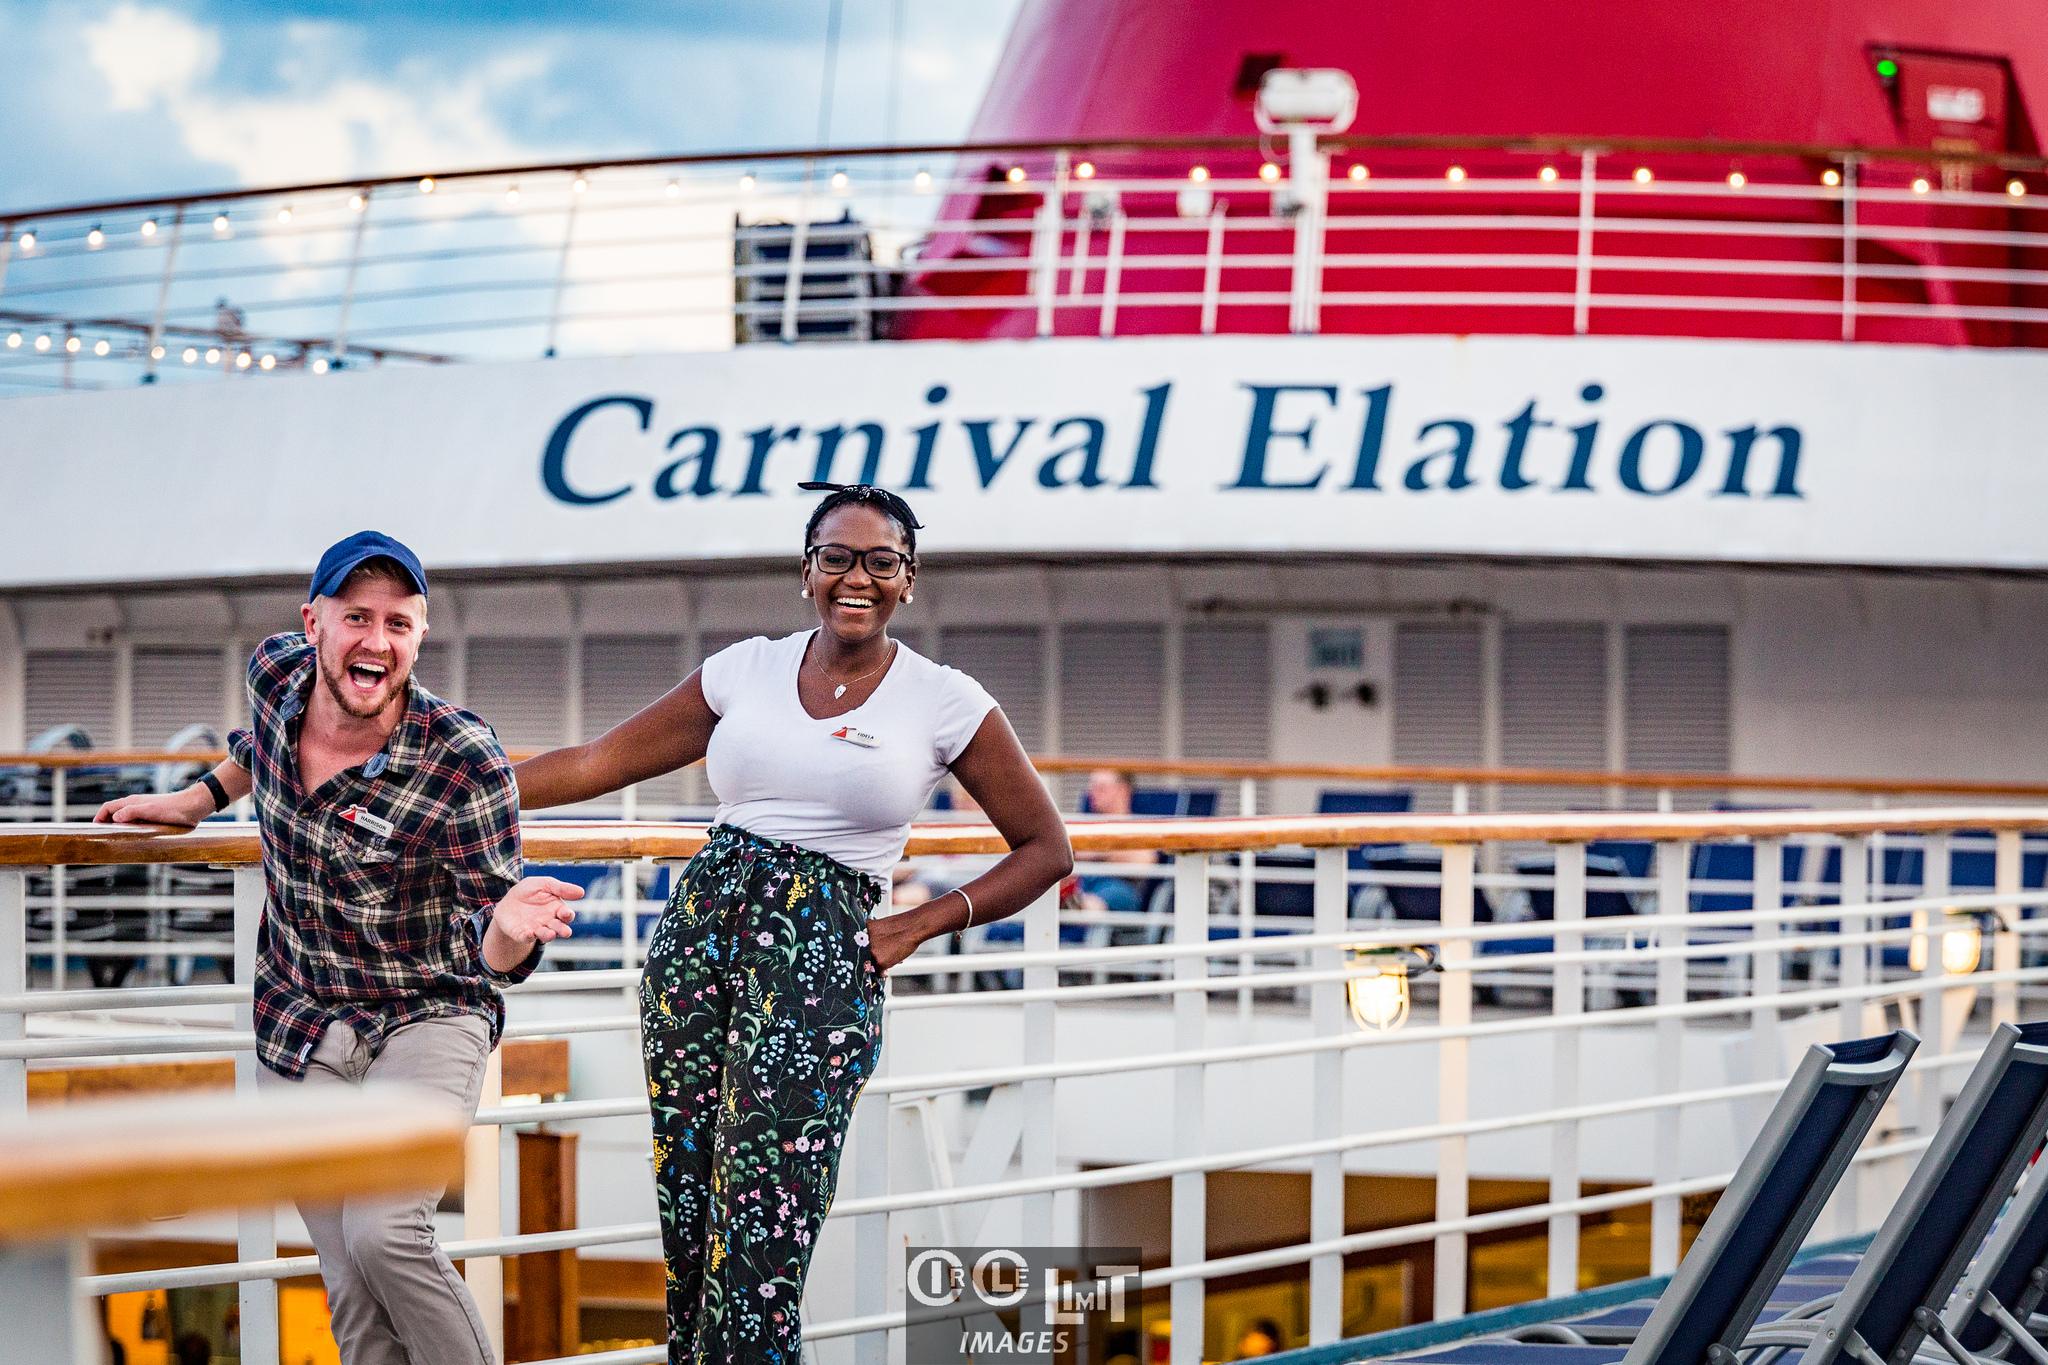 CarnivalElation-7452